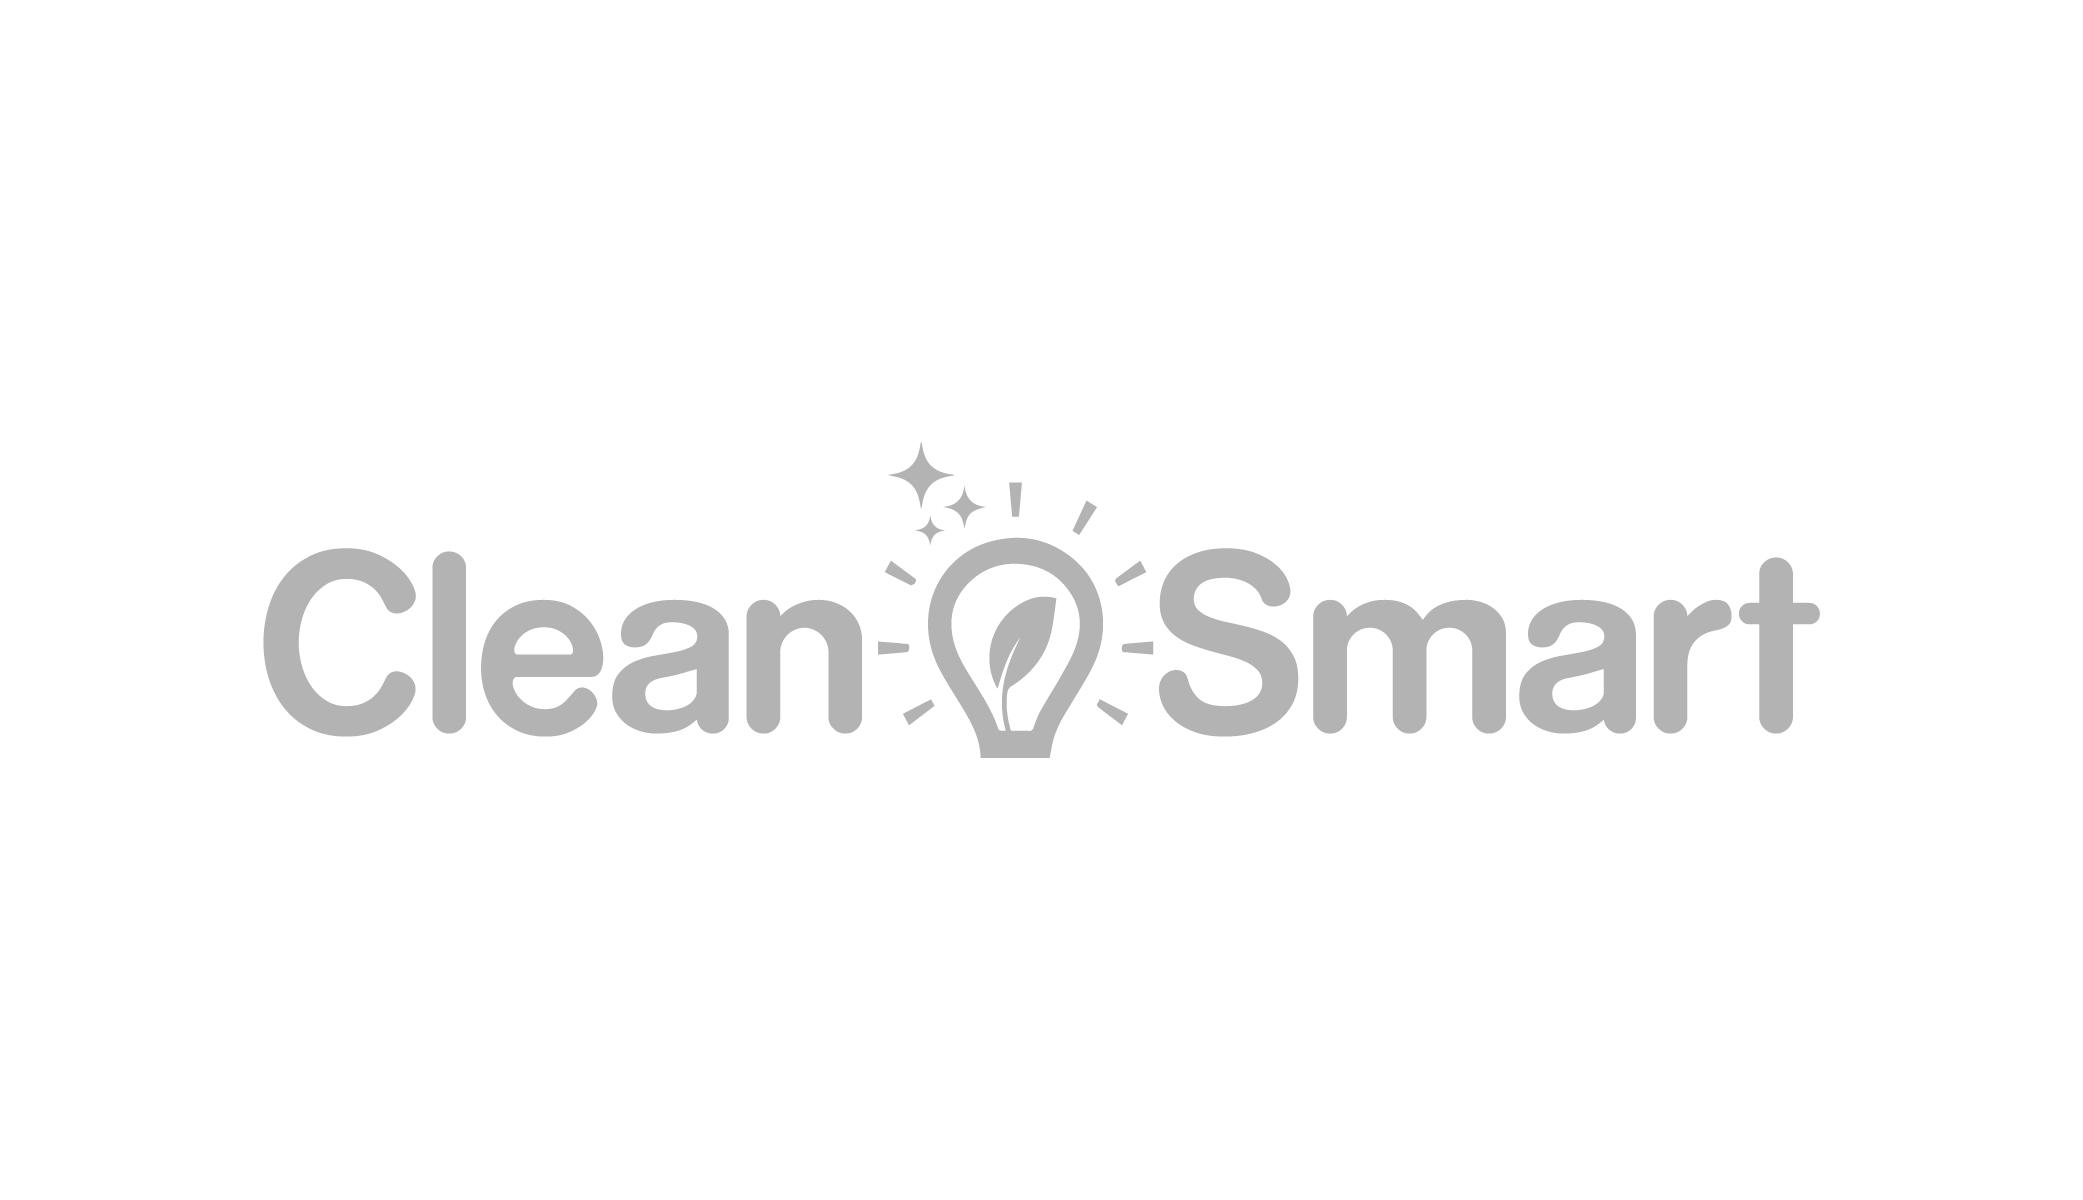 Logos Cliente ONCE86-13.jpg